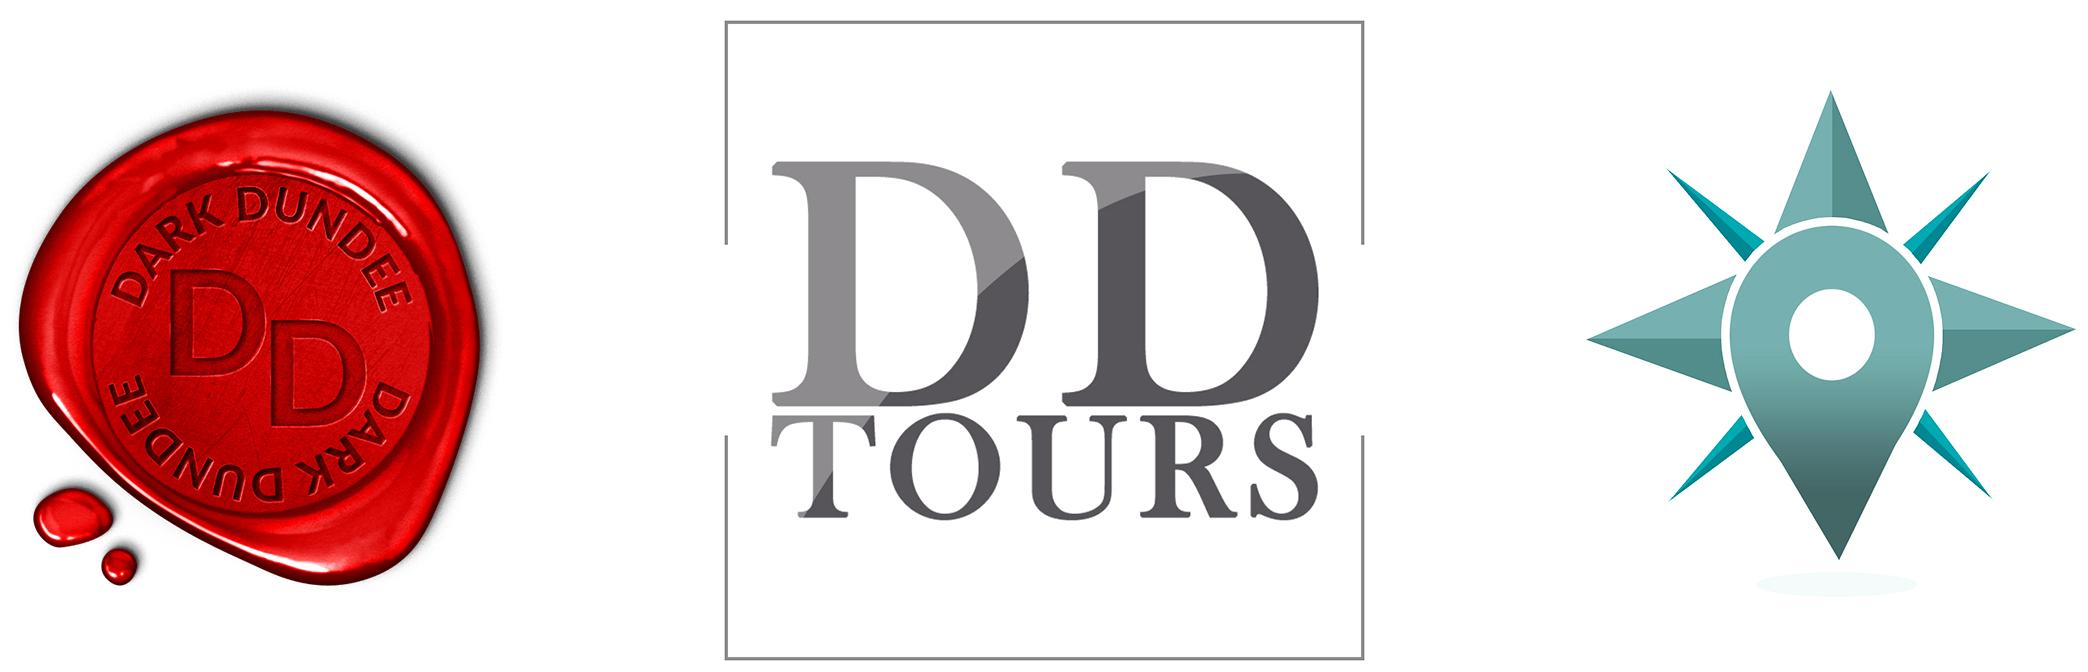 dd-tours-banner-WEB.jpg